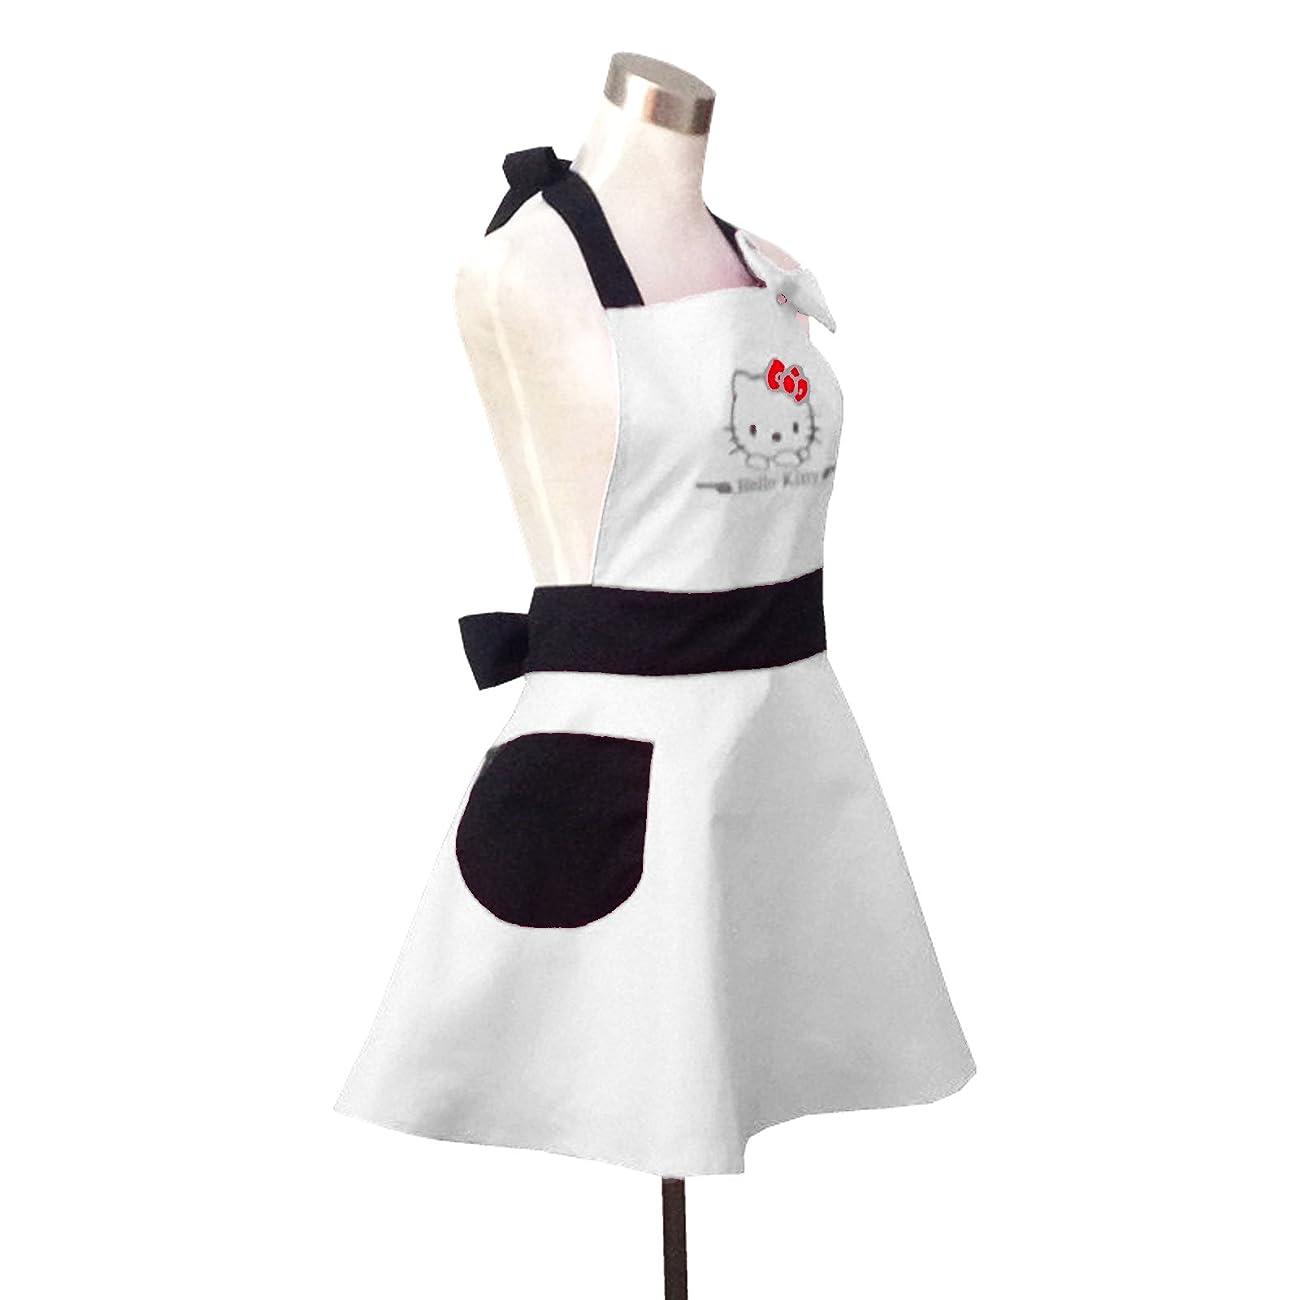 Lovely Hello Kitty White Retro Kitchen Aprons for Woman Girl Cotton Cooking Salon Pinafore Vintage Apron Dress 2